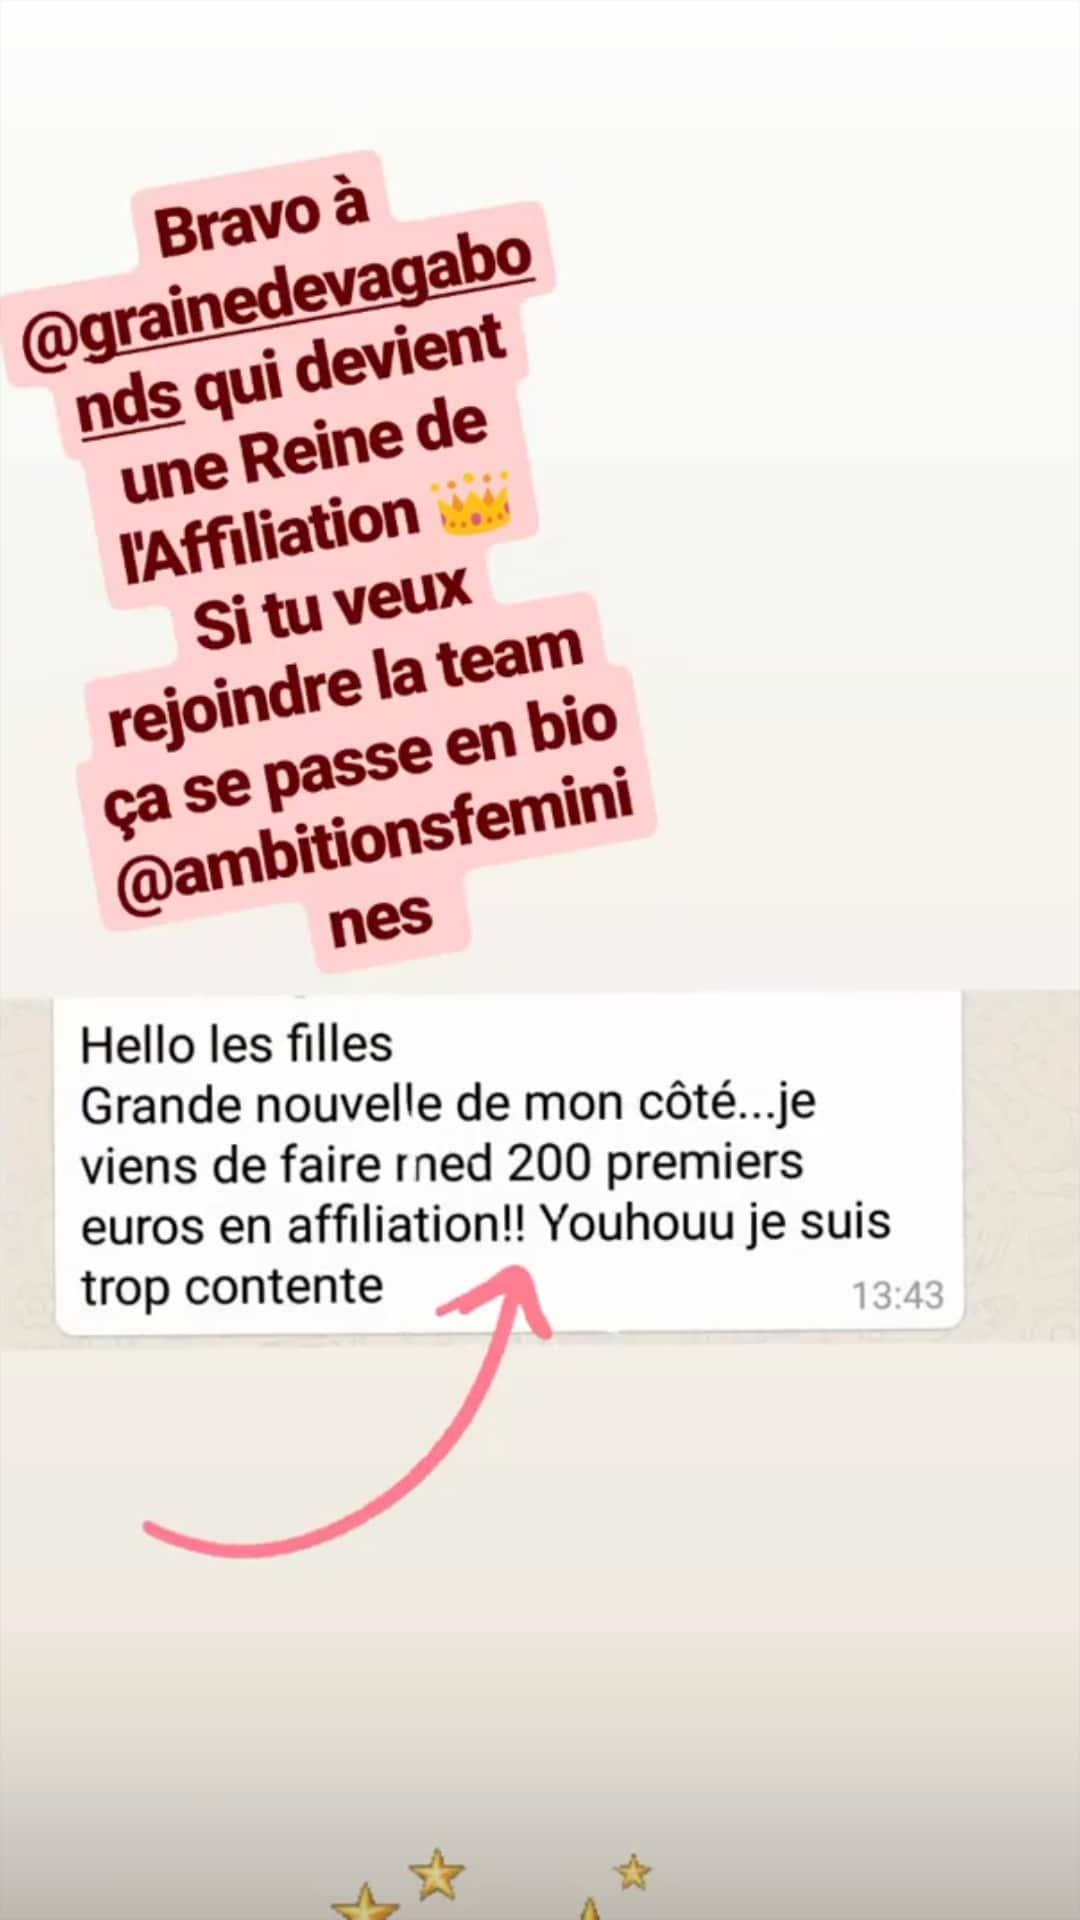 Avis-Les-Reines-Affiliation_20200605_084746